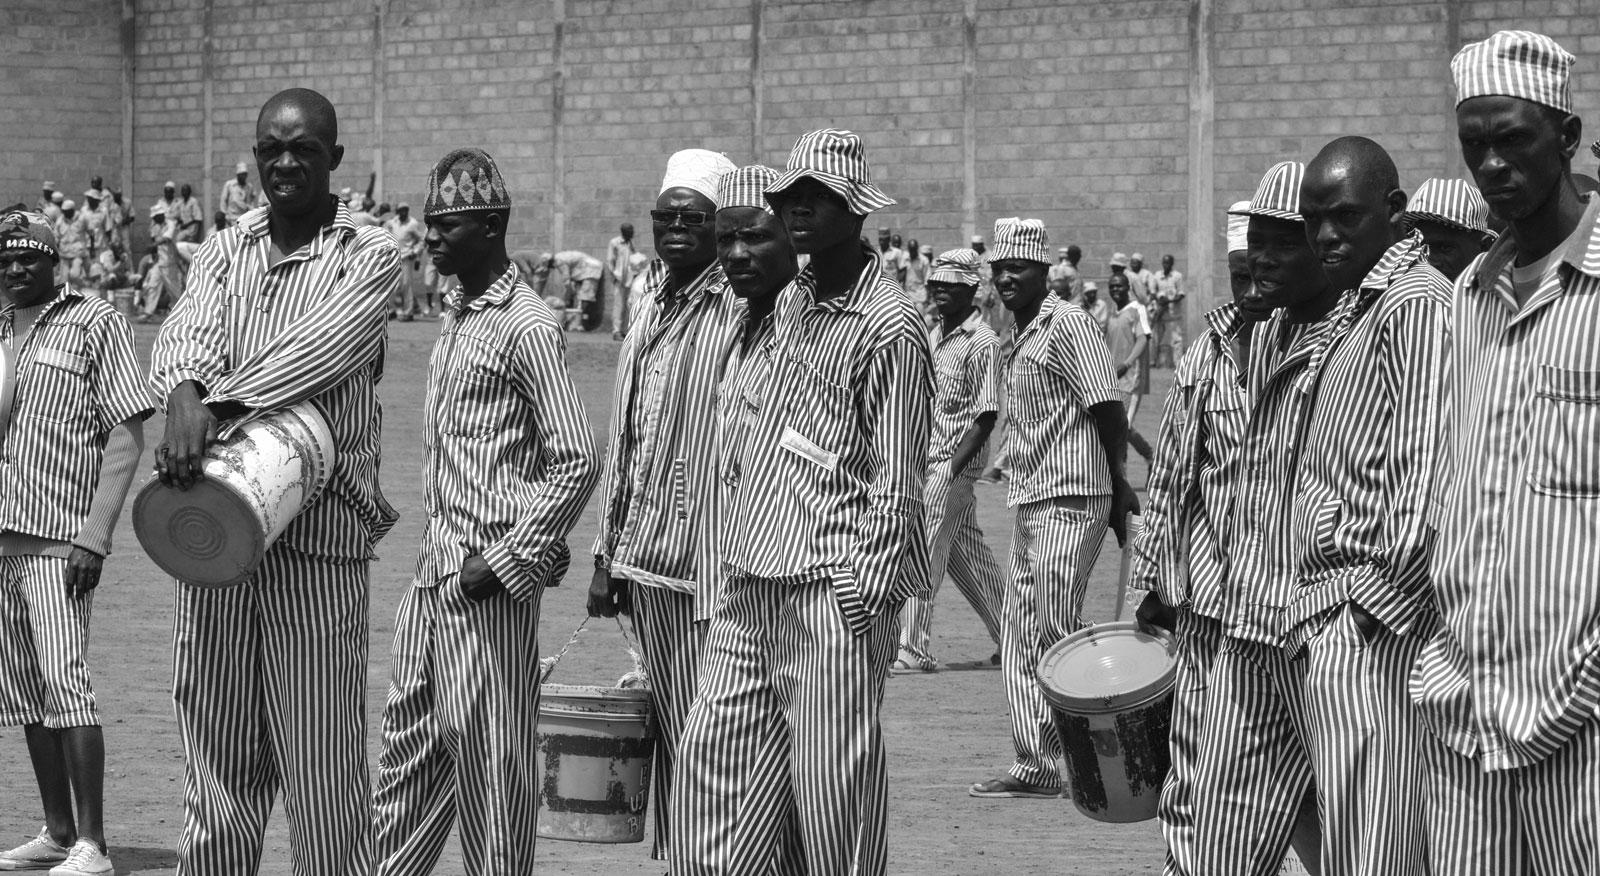 The Prisoners